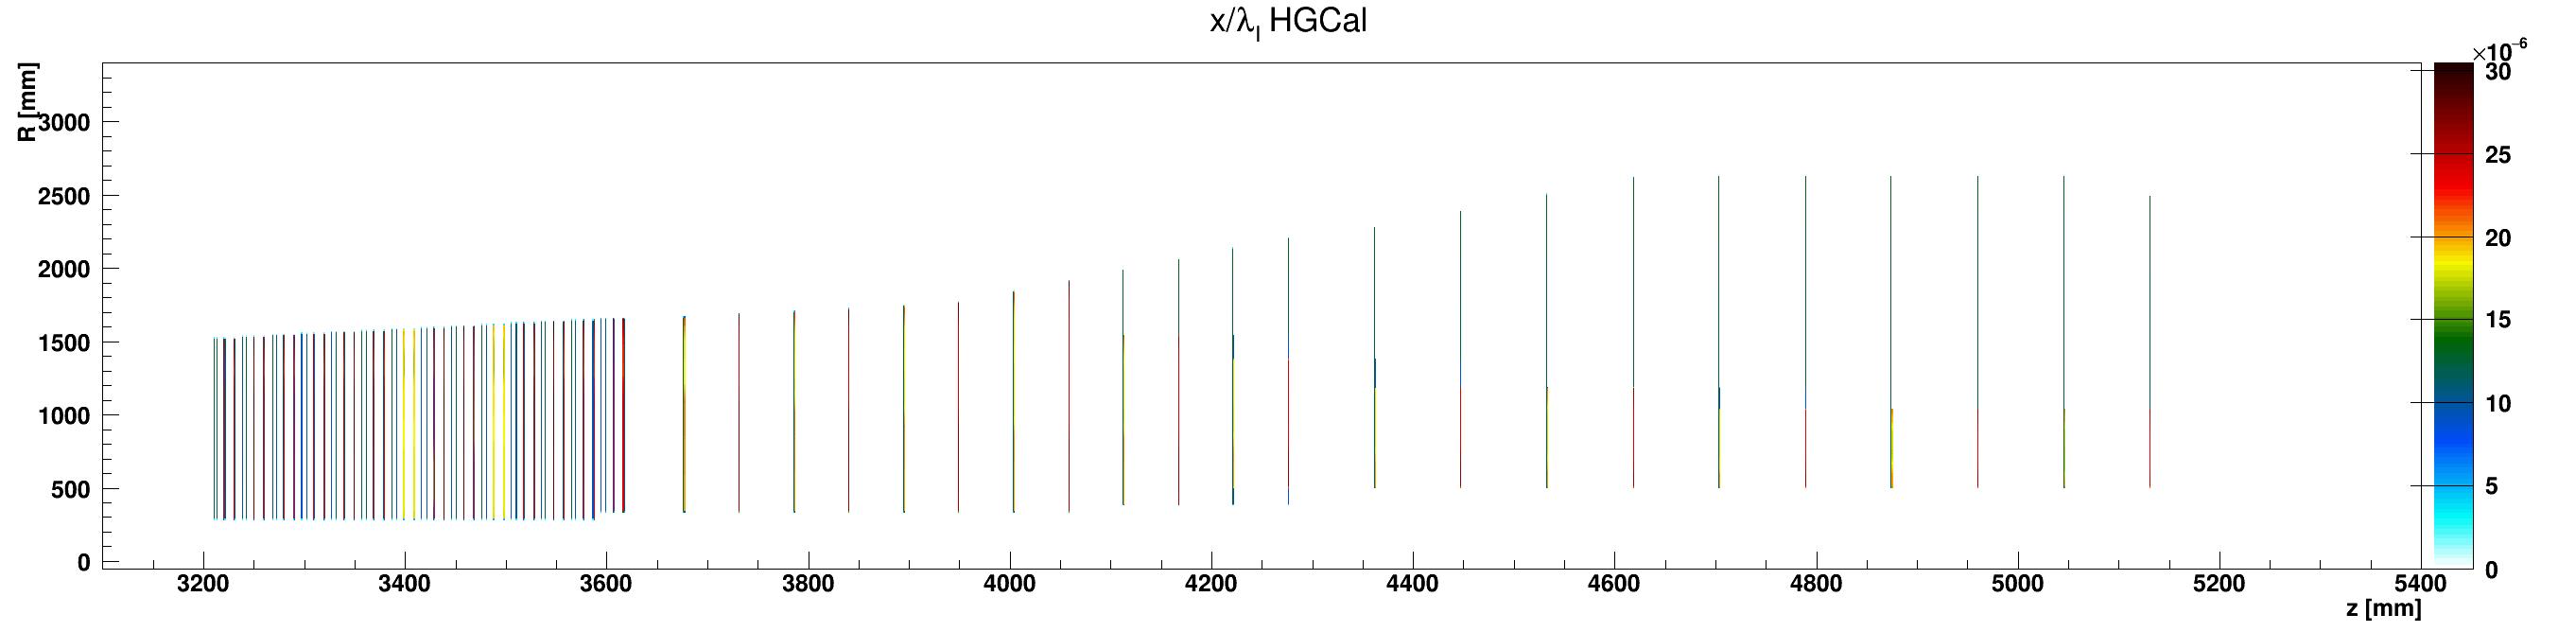 HGCal_l_vs_z_vs_RlocEpoxy_ZplusZoom.png